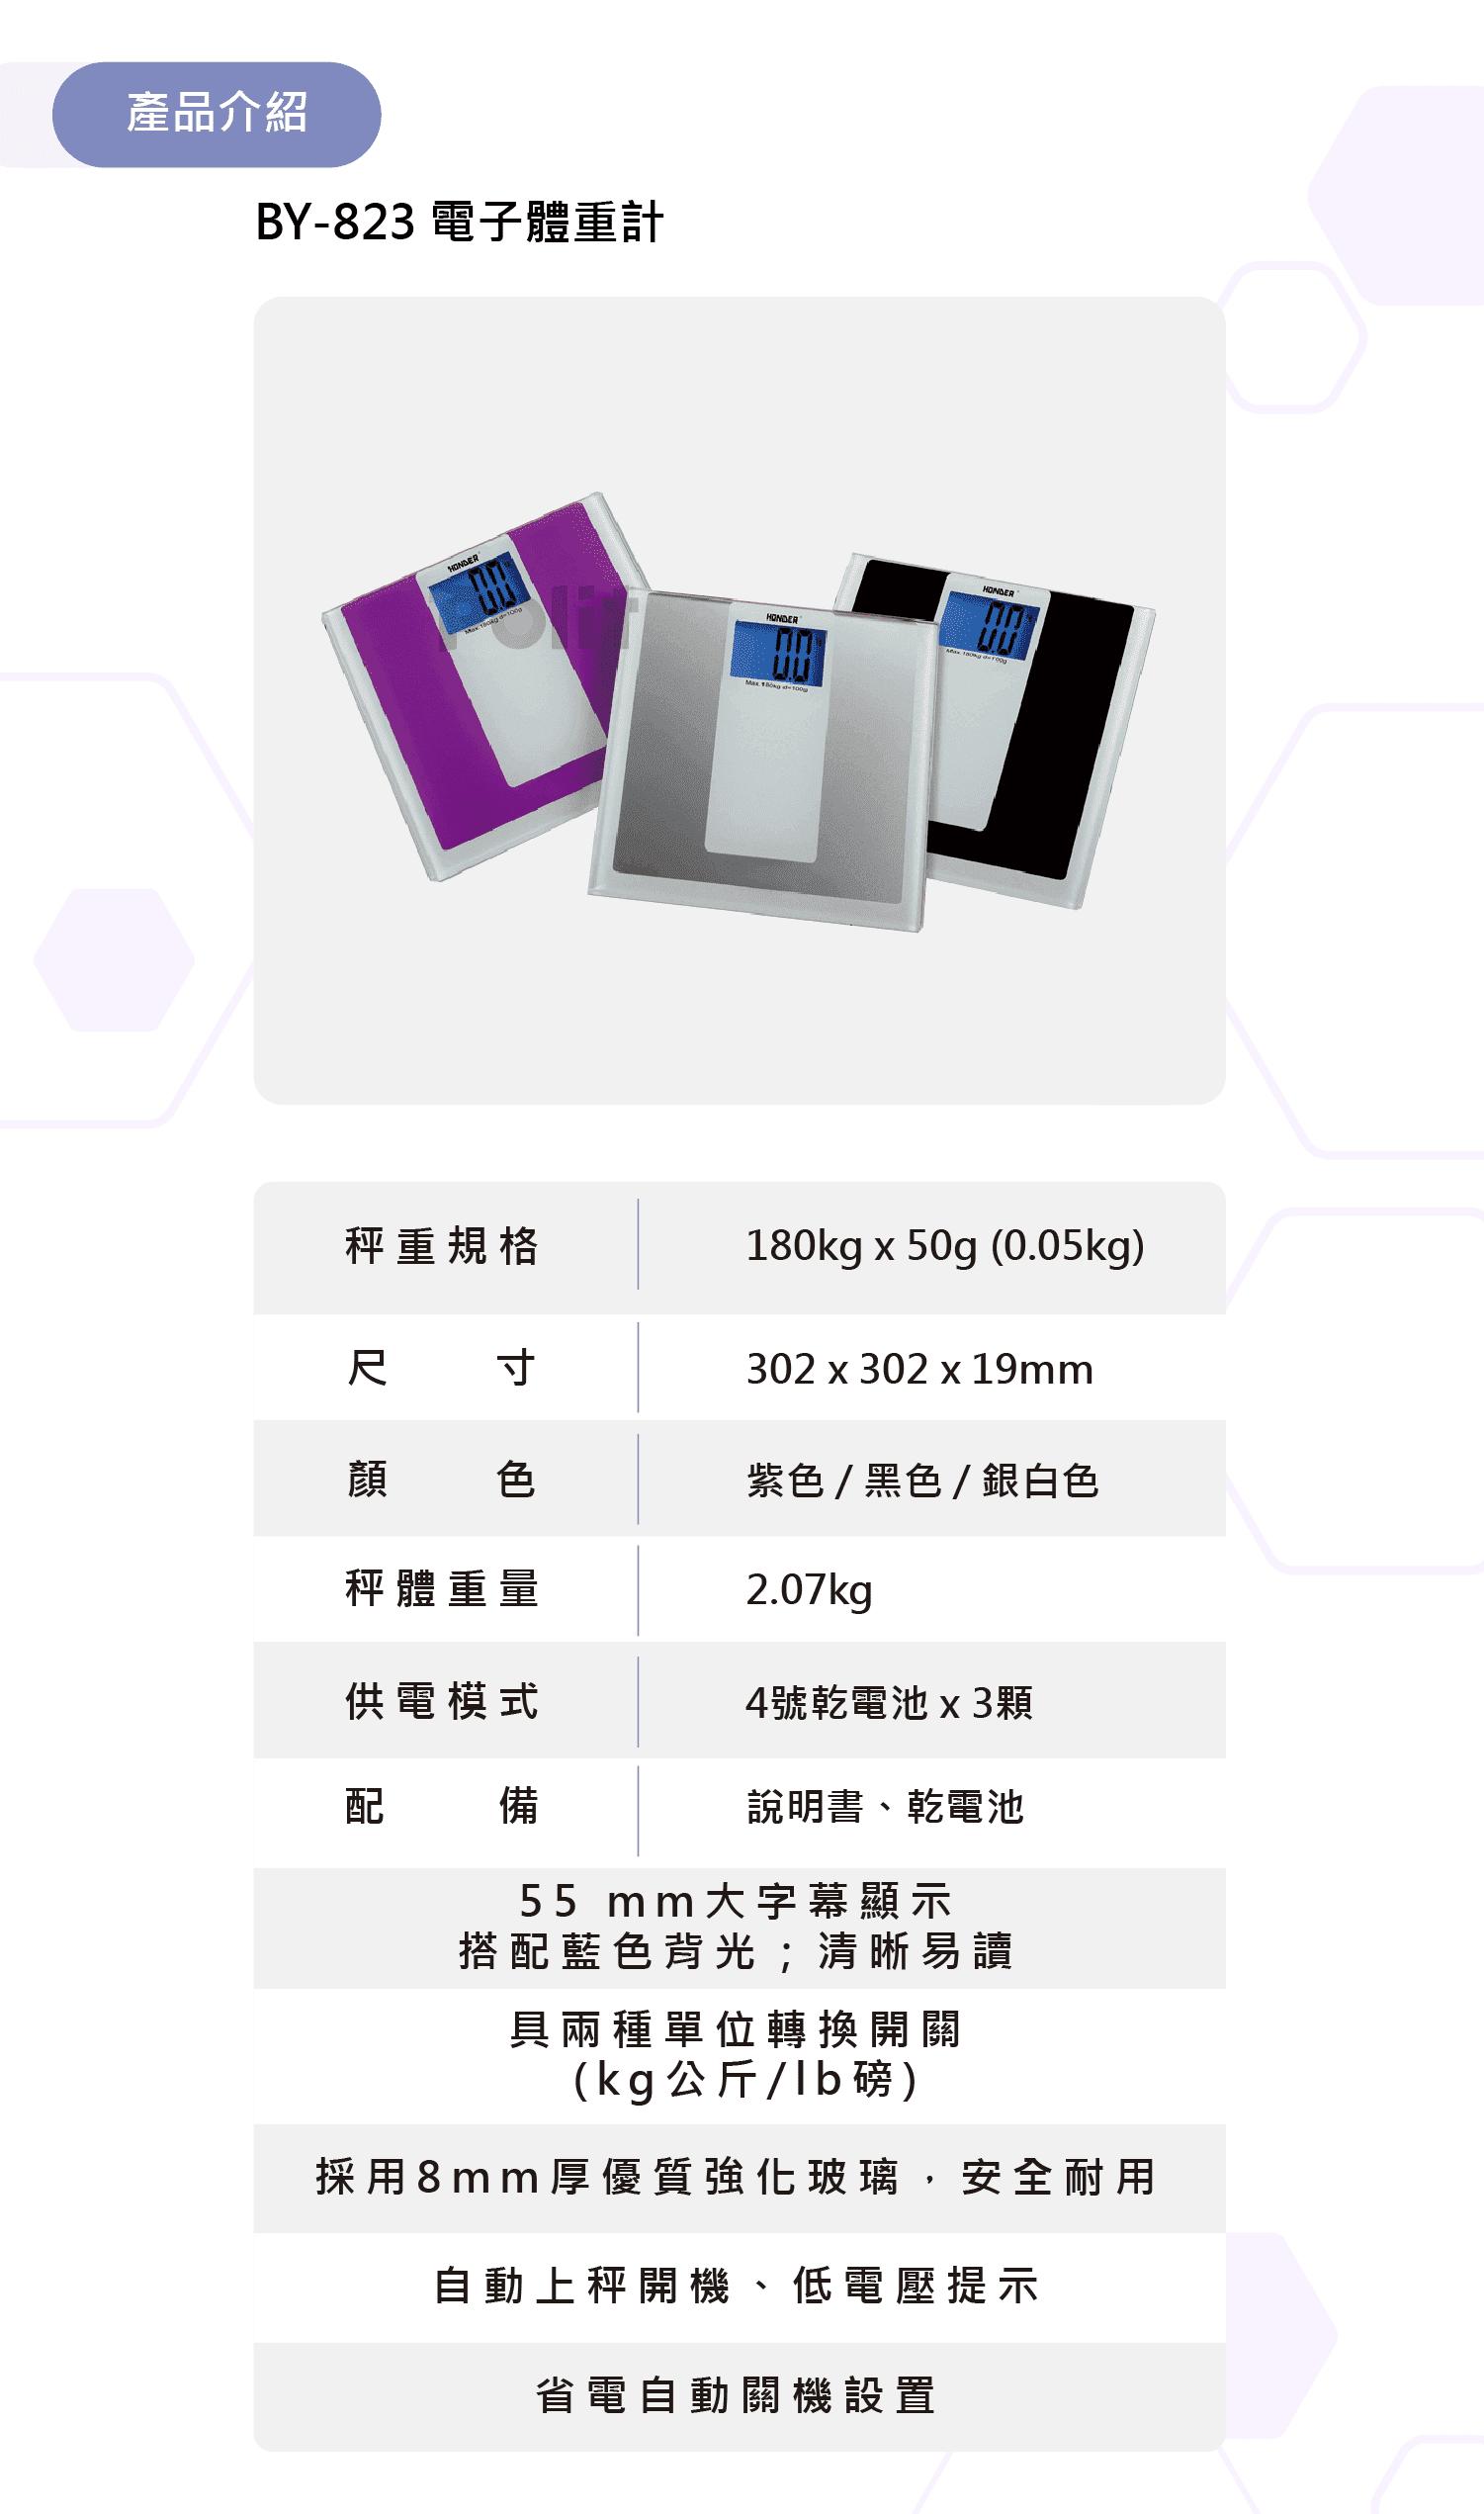 BY-823 電子體重計 | 沛禮國際 Polit 電子秤專賣